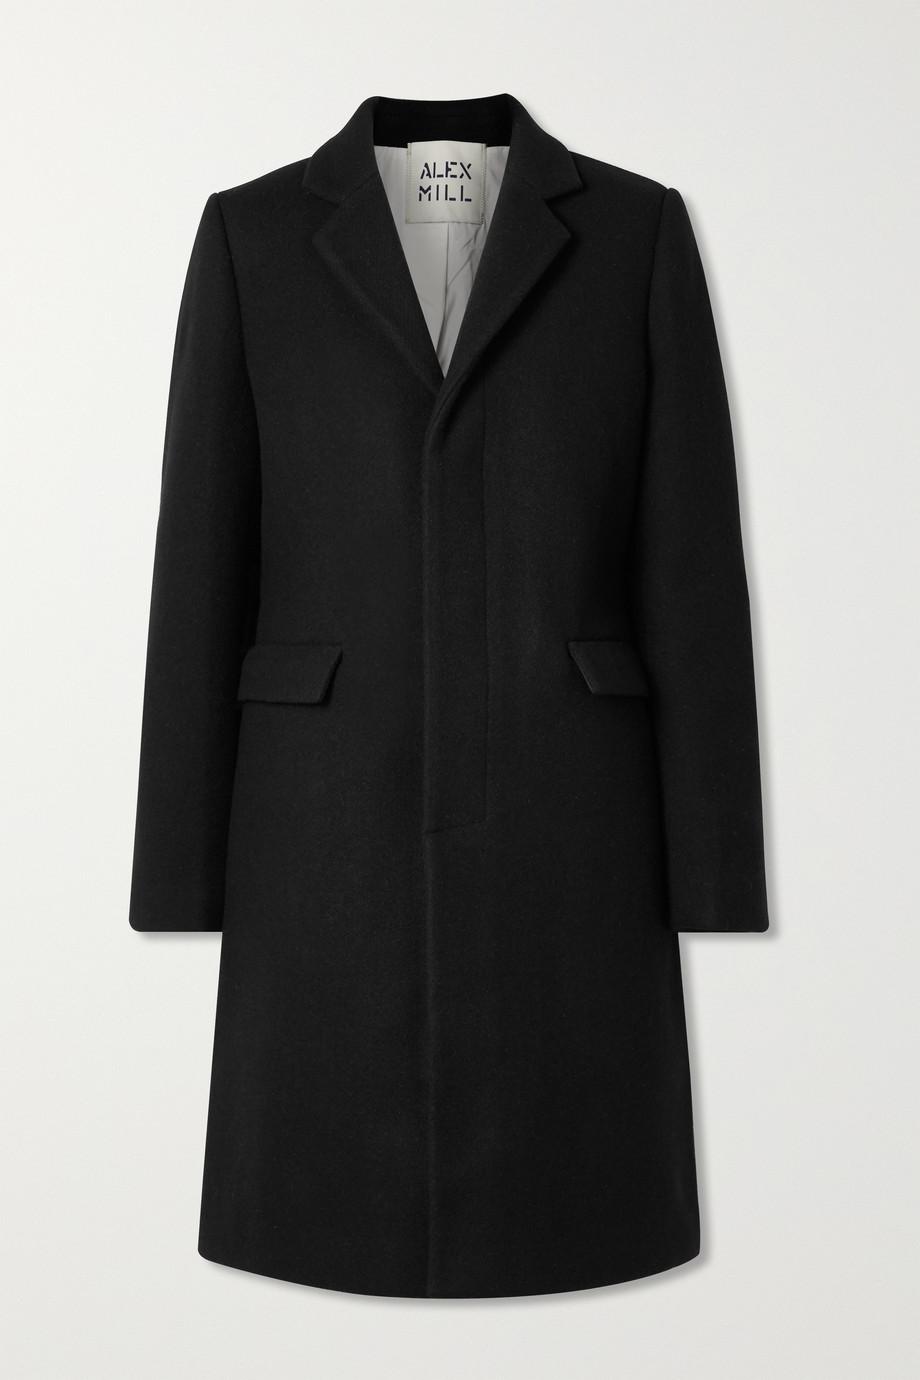 Alex Mill Brittany wool-blend coat